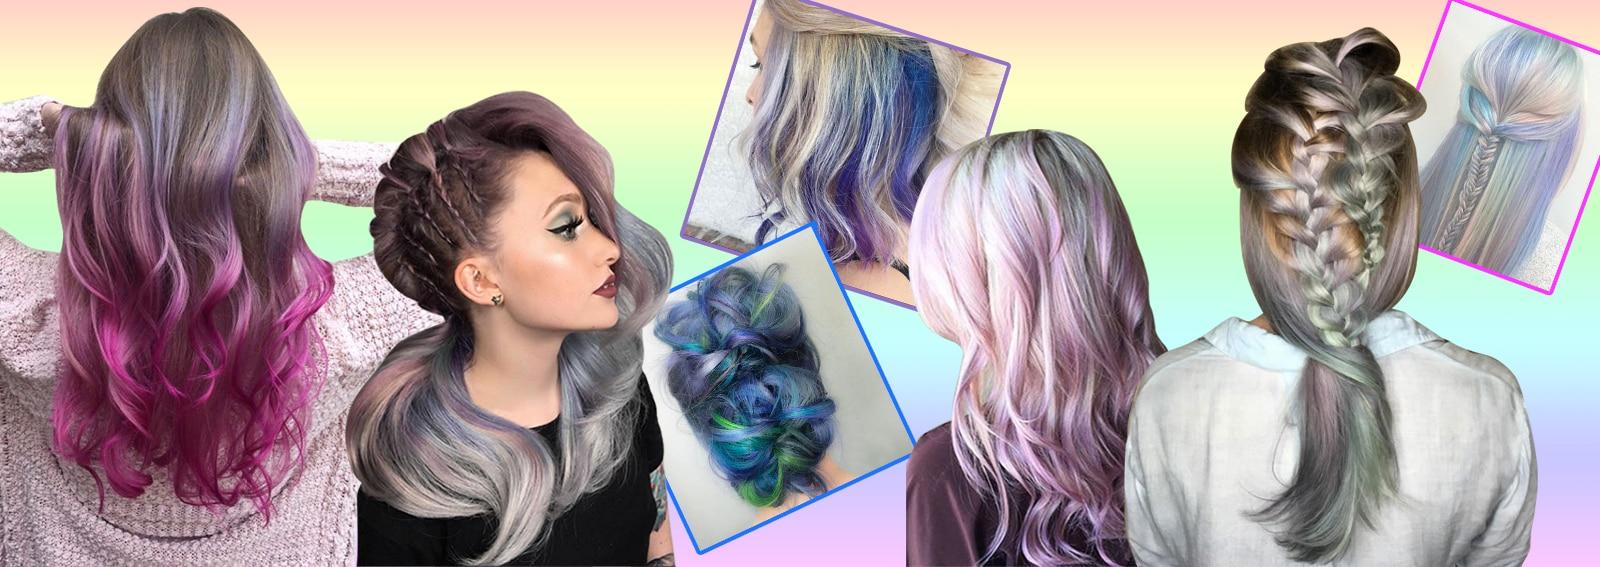 mermicorn hair la tendenza da instagram